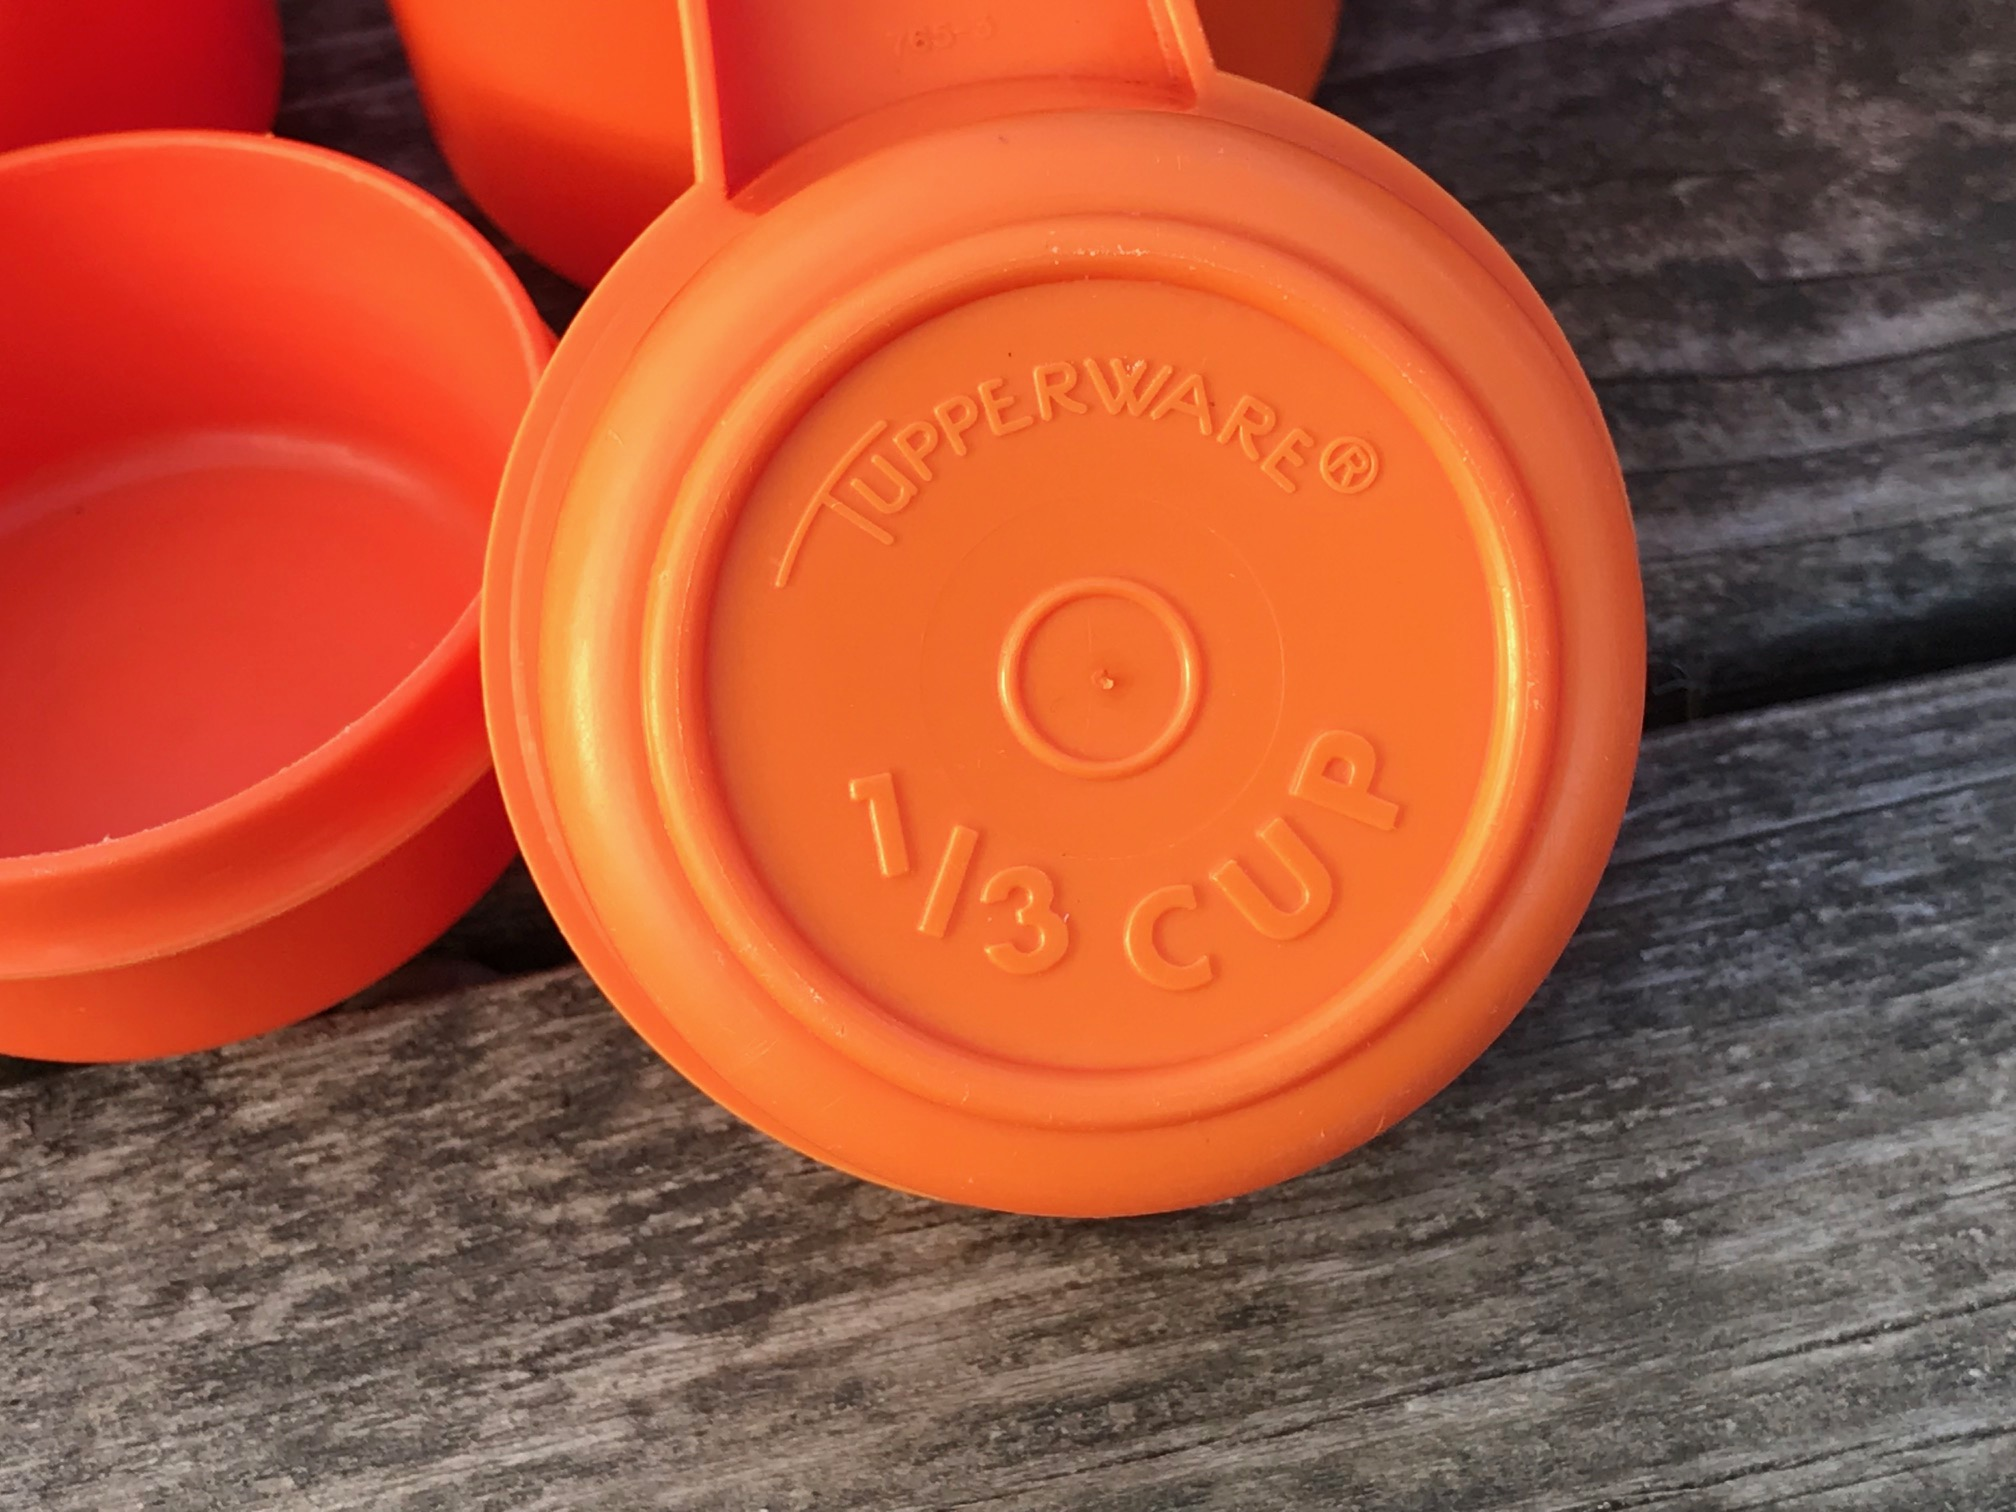 Orange Tupperware Vintage Measuring Cups: 61 ppm Cadmium. Cadmium is a known carcinogen for humans.